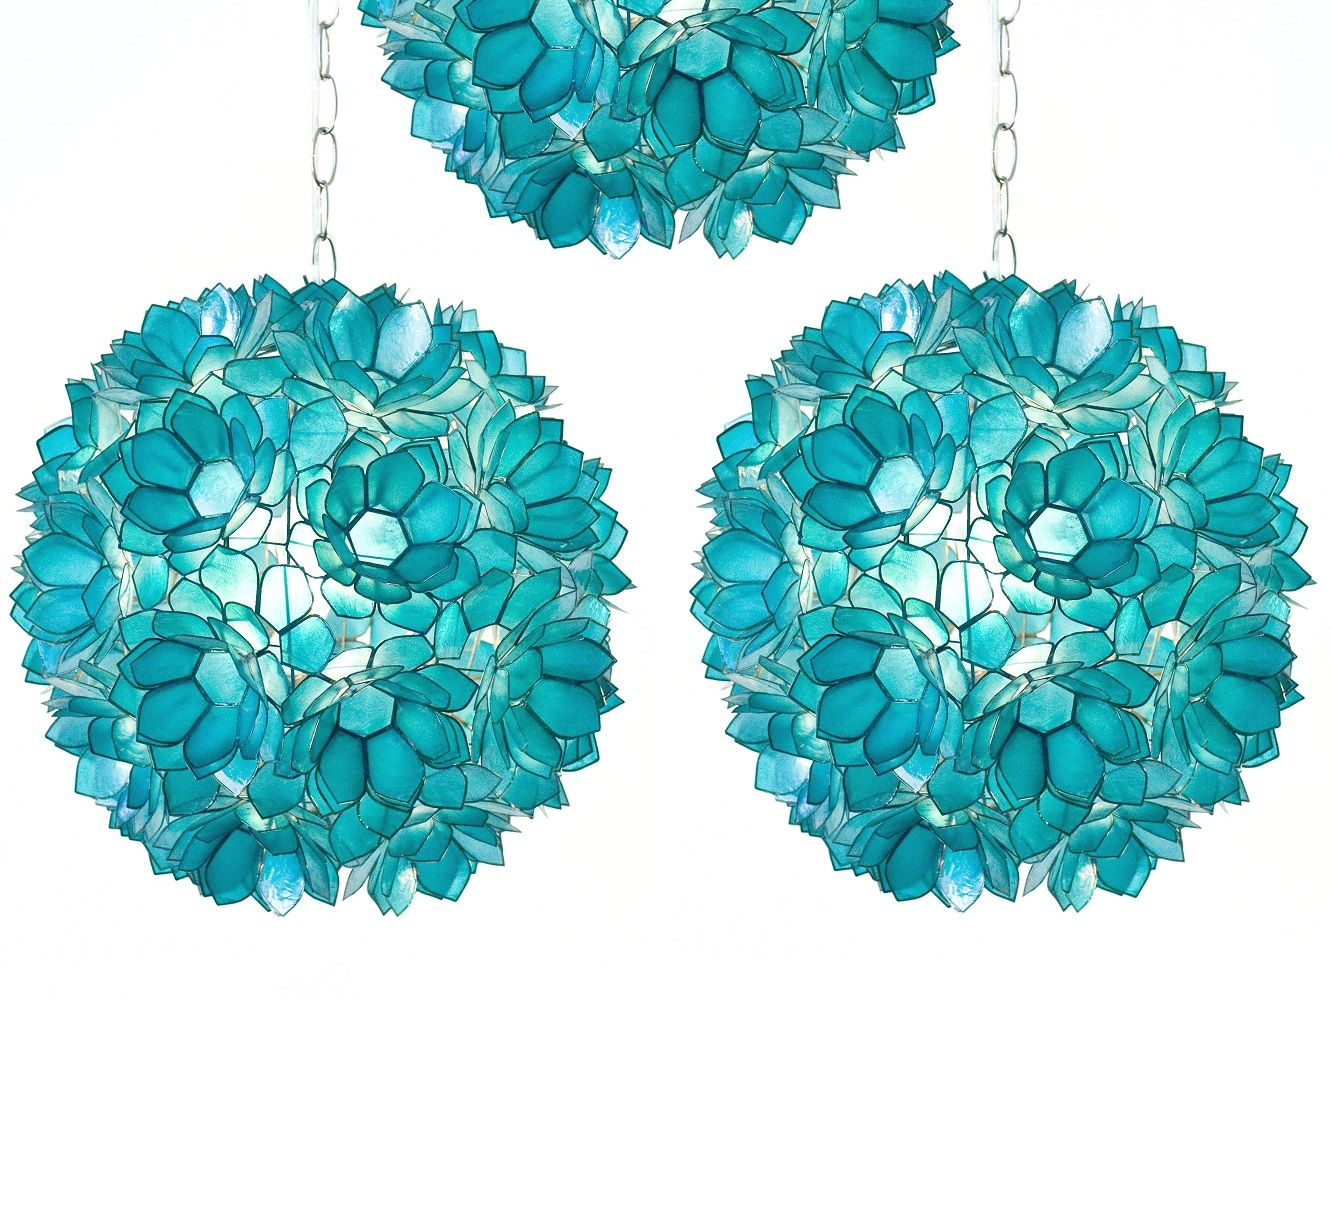 Turquoise capiz shell pendants inspiring hollywood - Capiz shell bathroom accessories ...